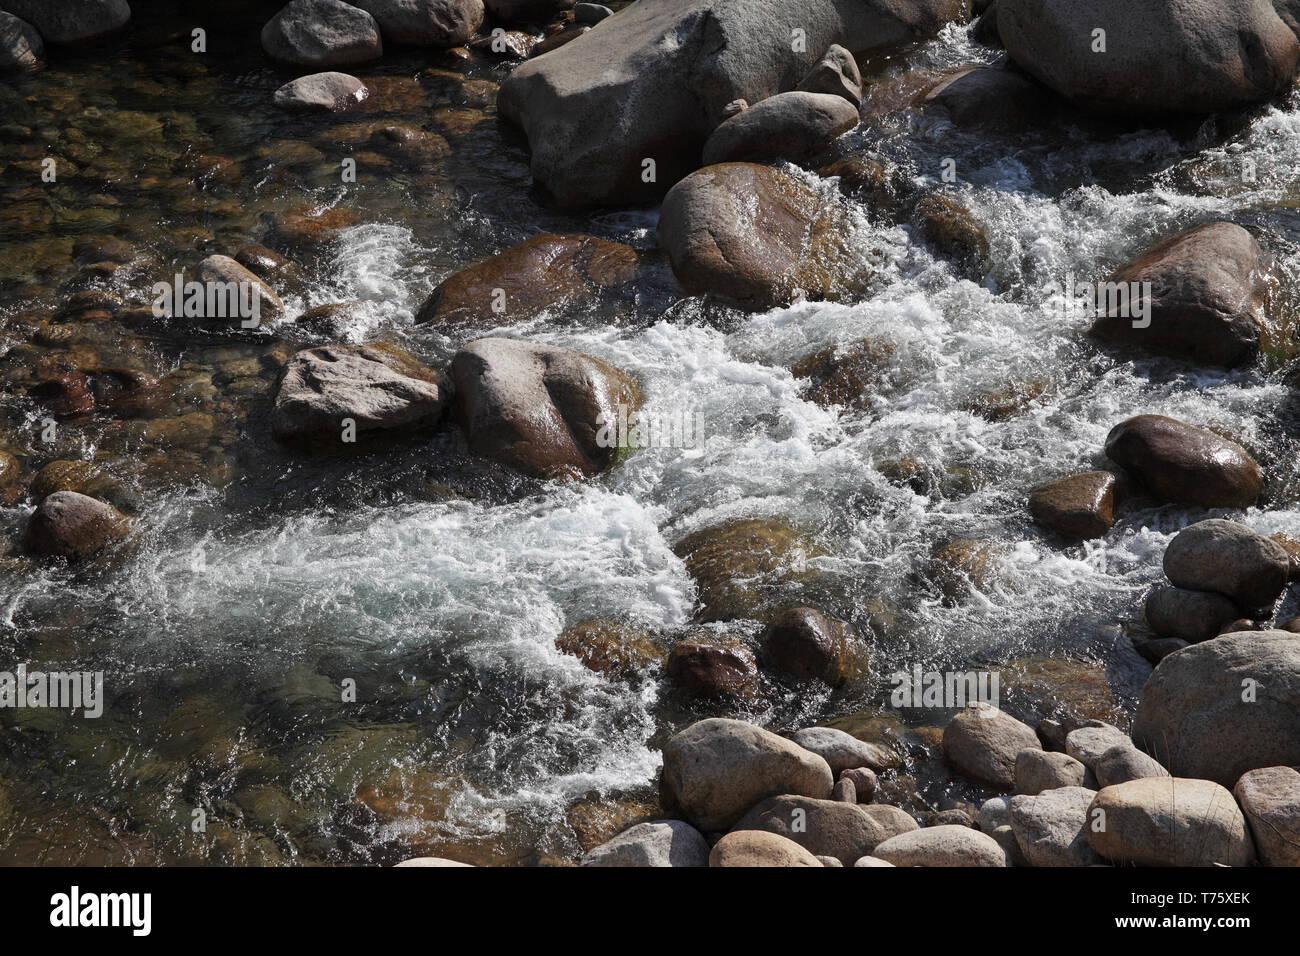 Rocks in the Solenzara River Parc Naturel Regional de Corse Corsica France Stock Photo